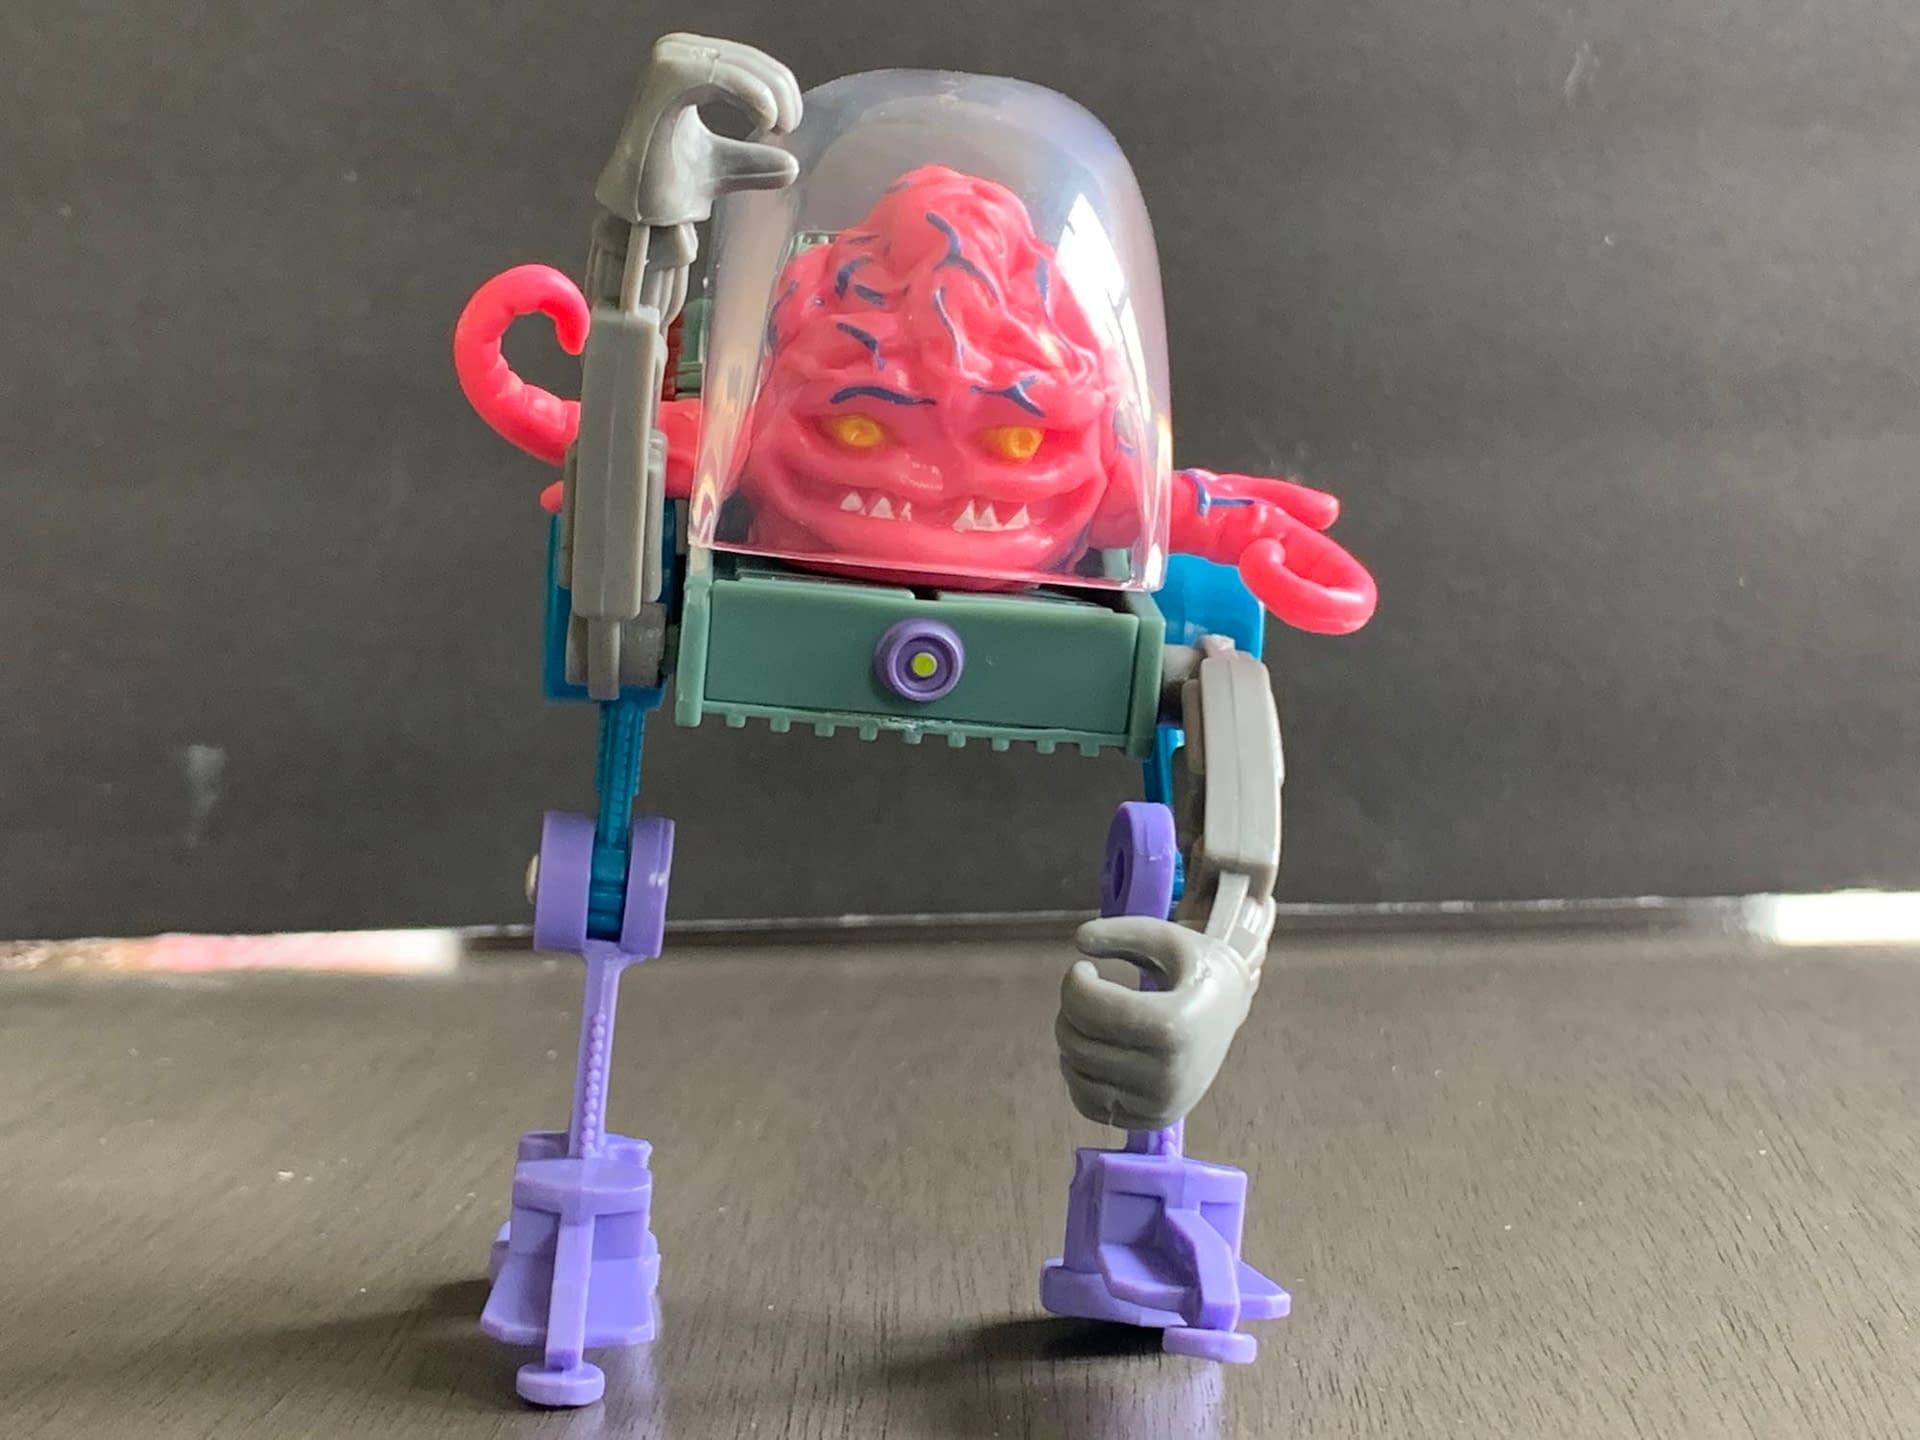 TMNT Playmates Mutant Module Retro Set Is Nostalgic Fun